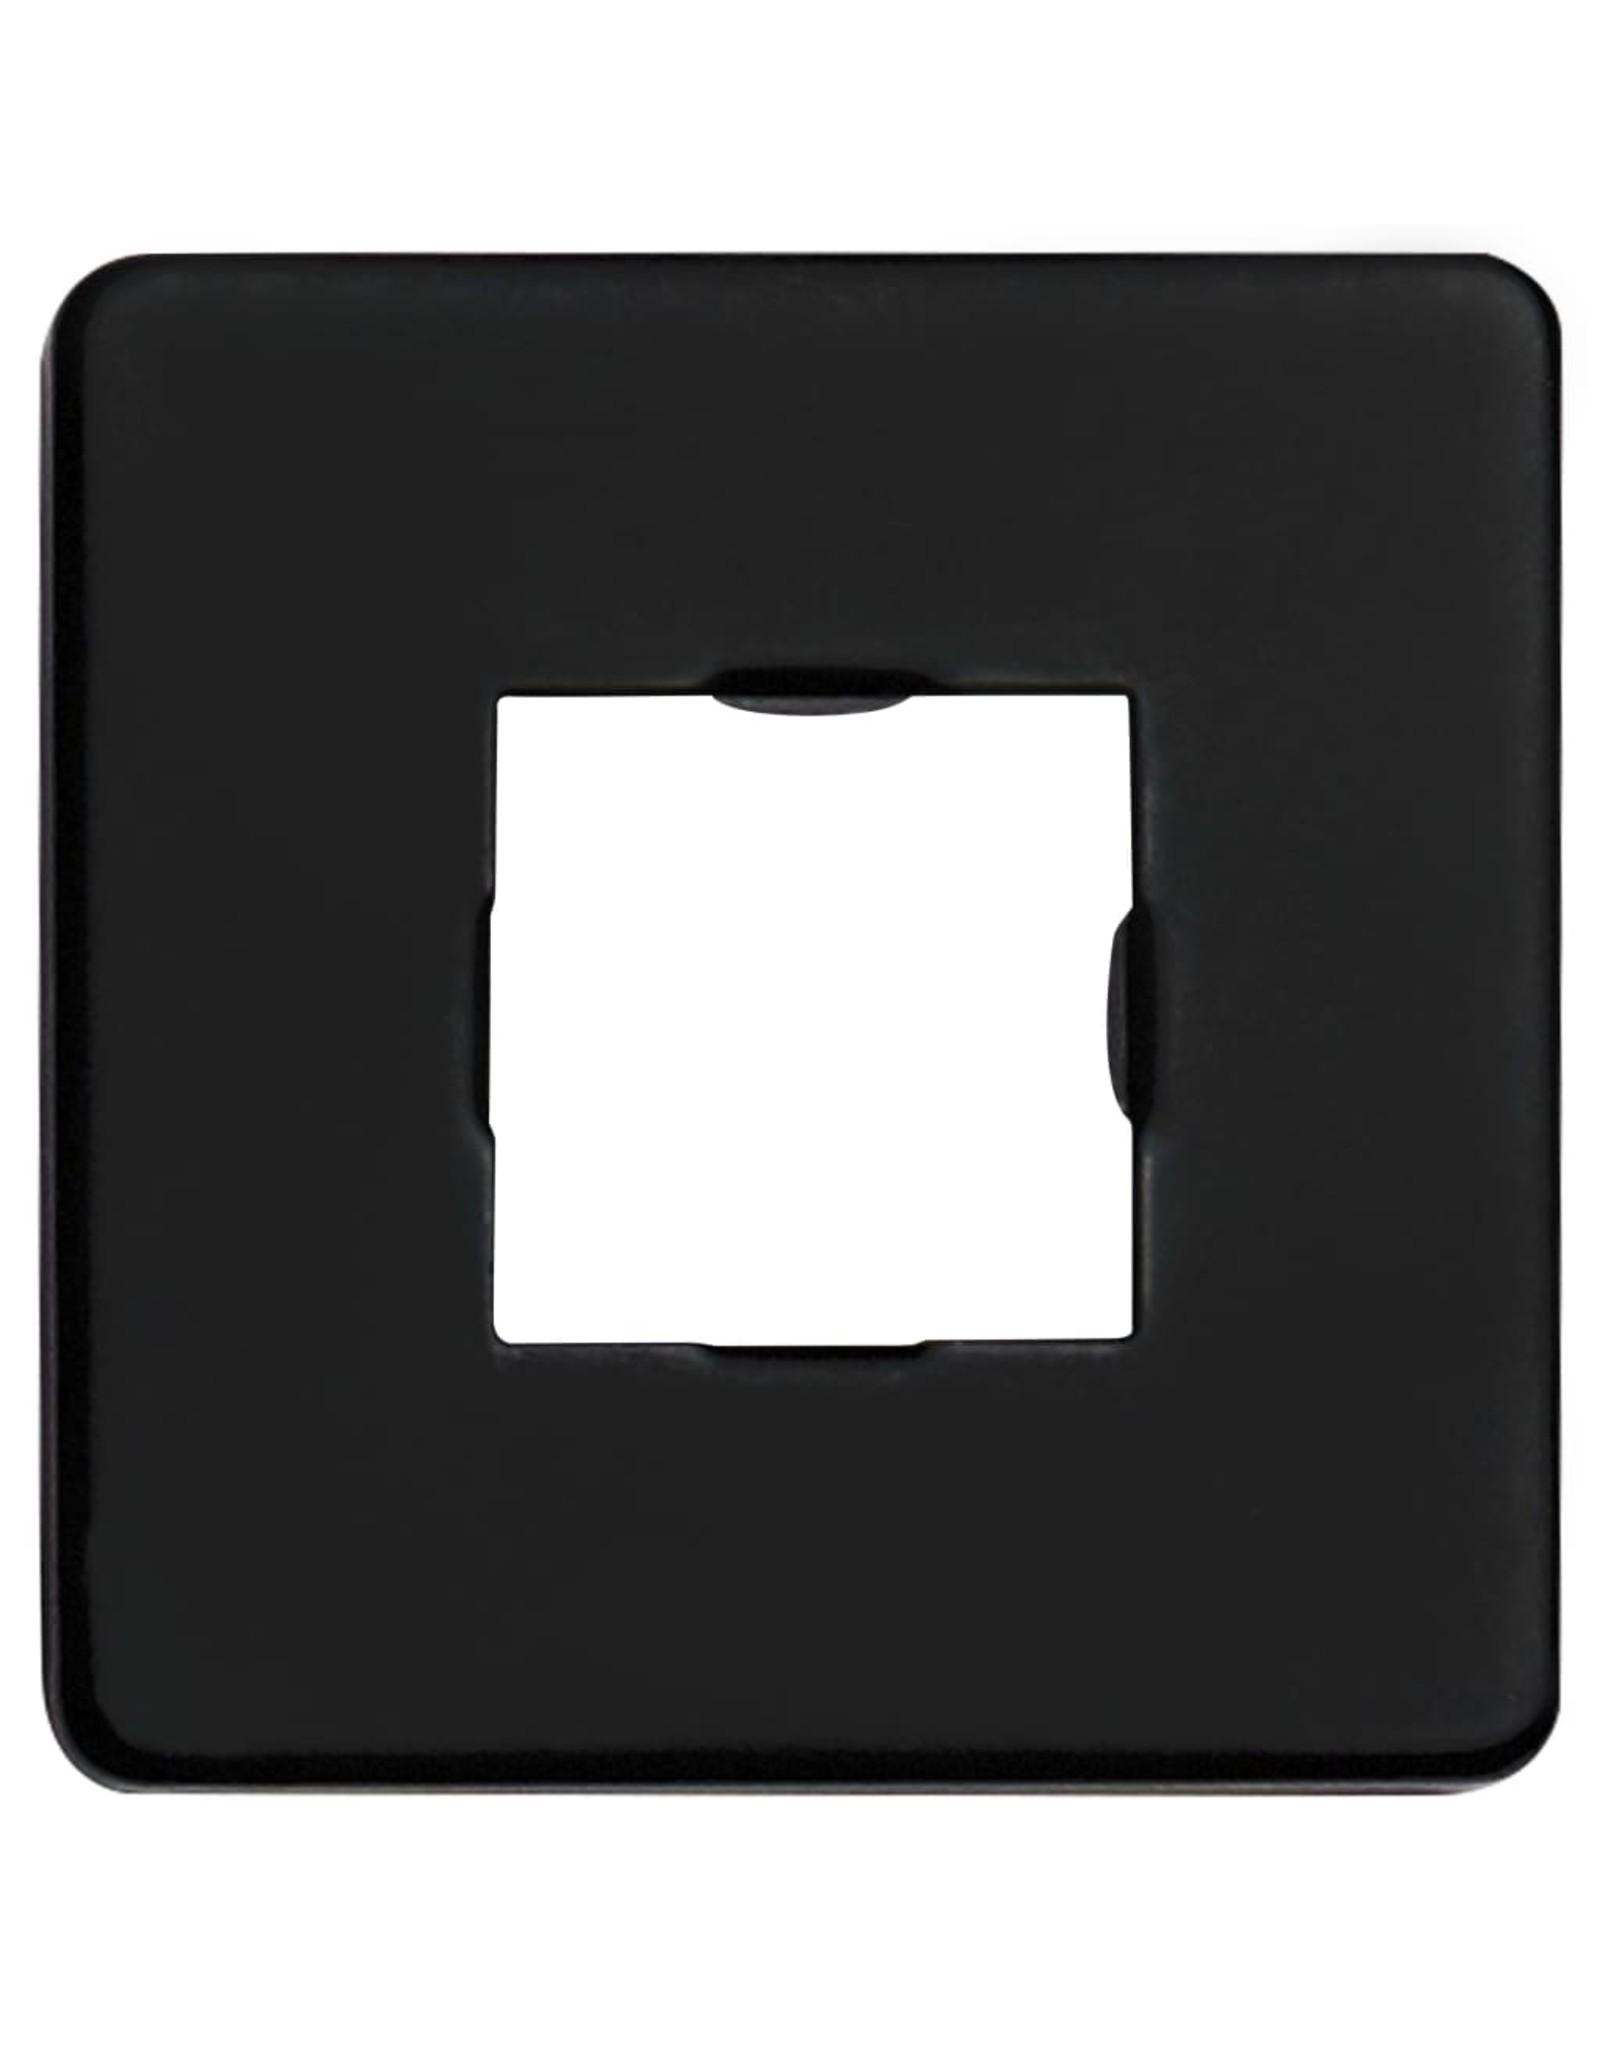 Douchearm vierkant 30 cm roestvrij staal 201 zwart